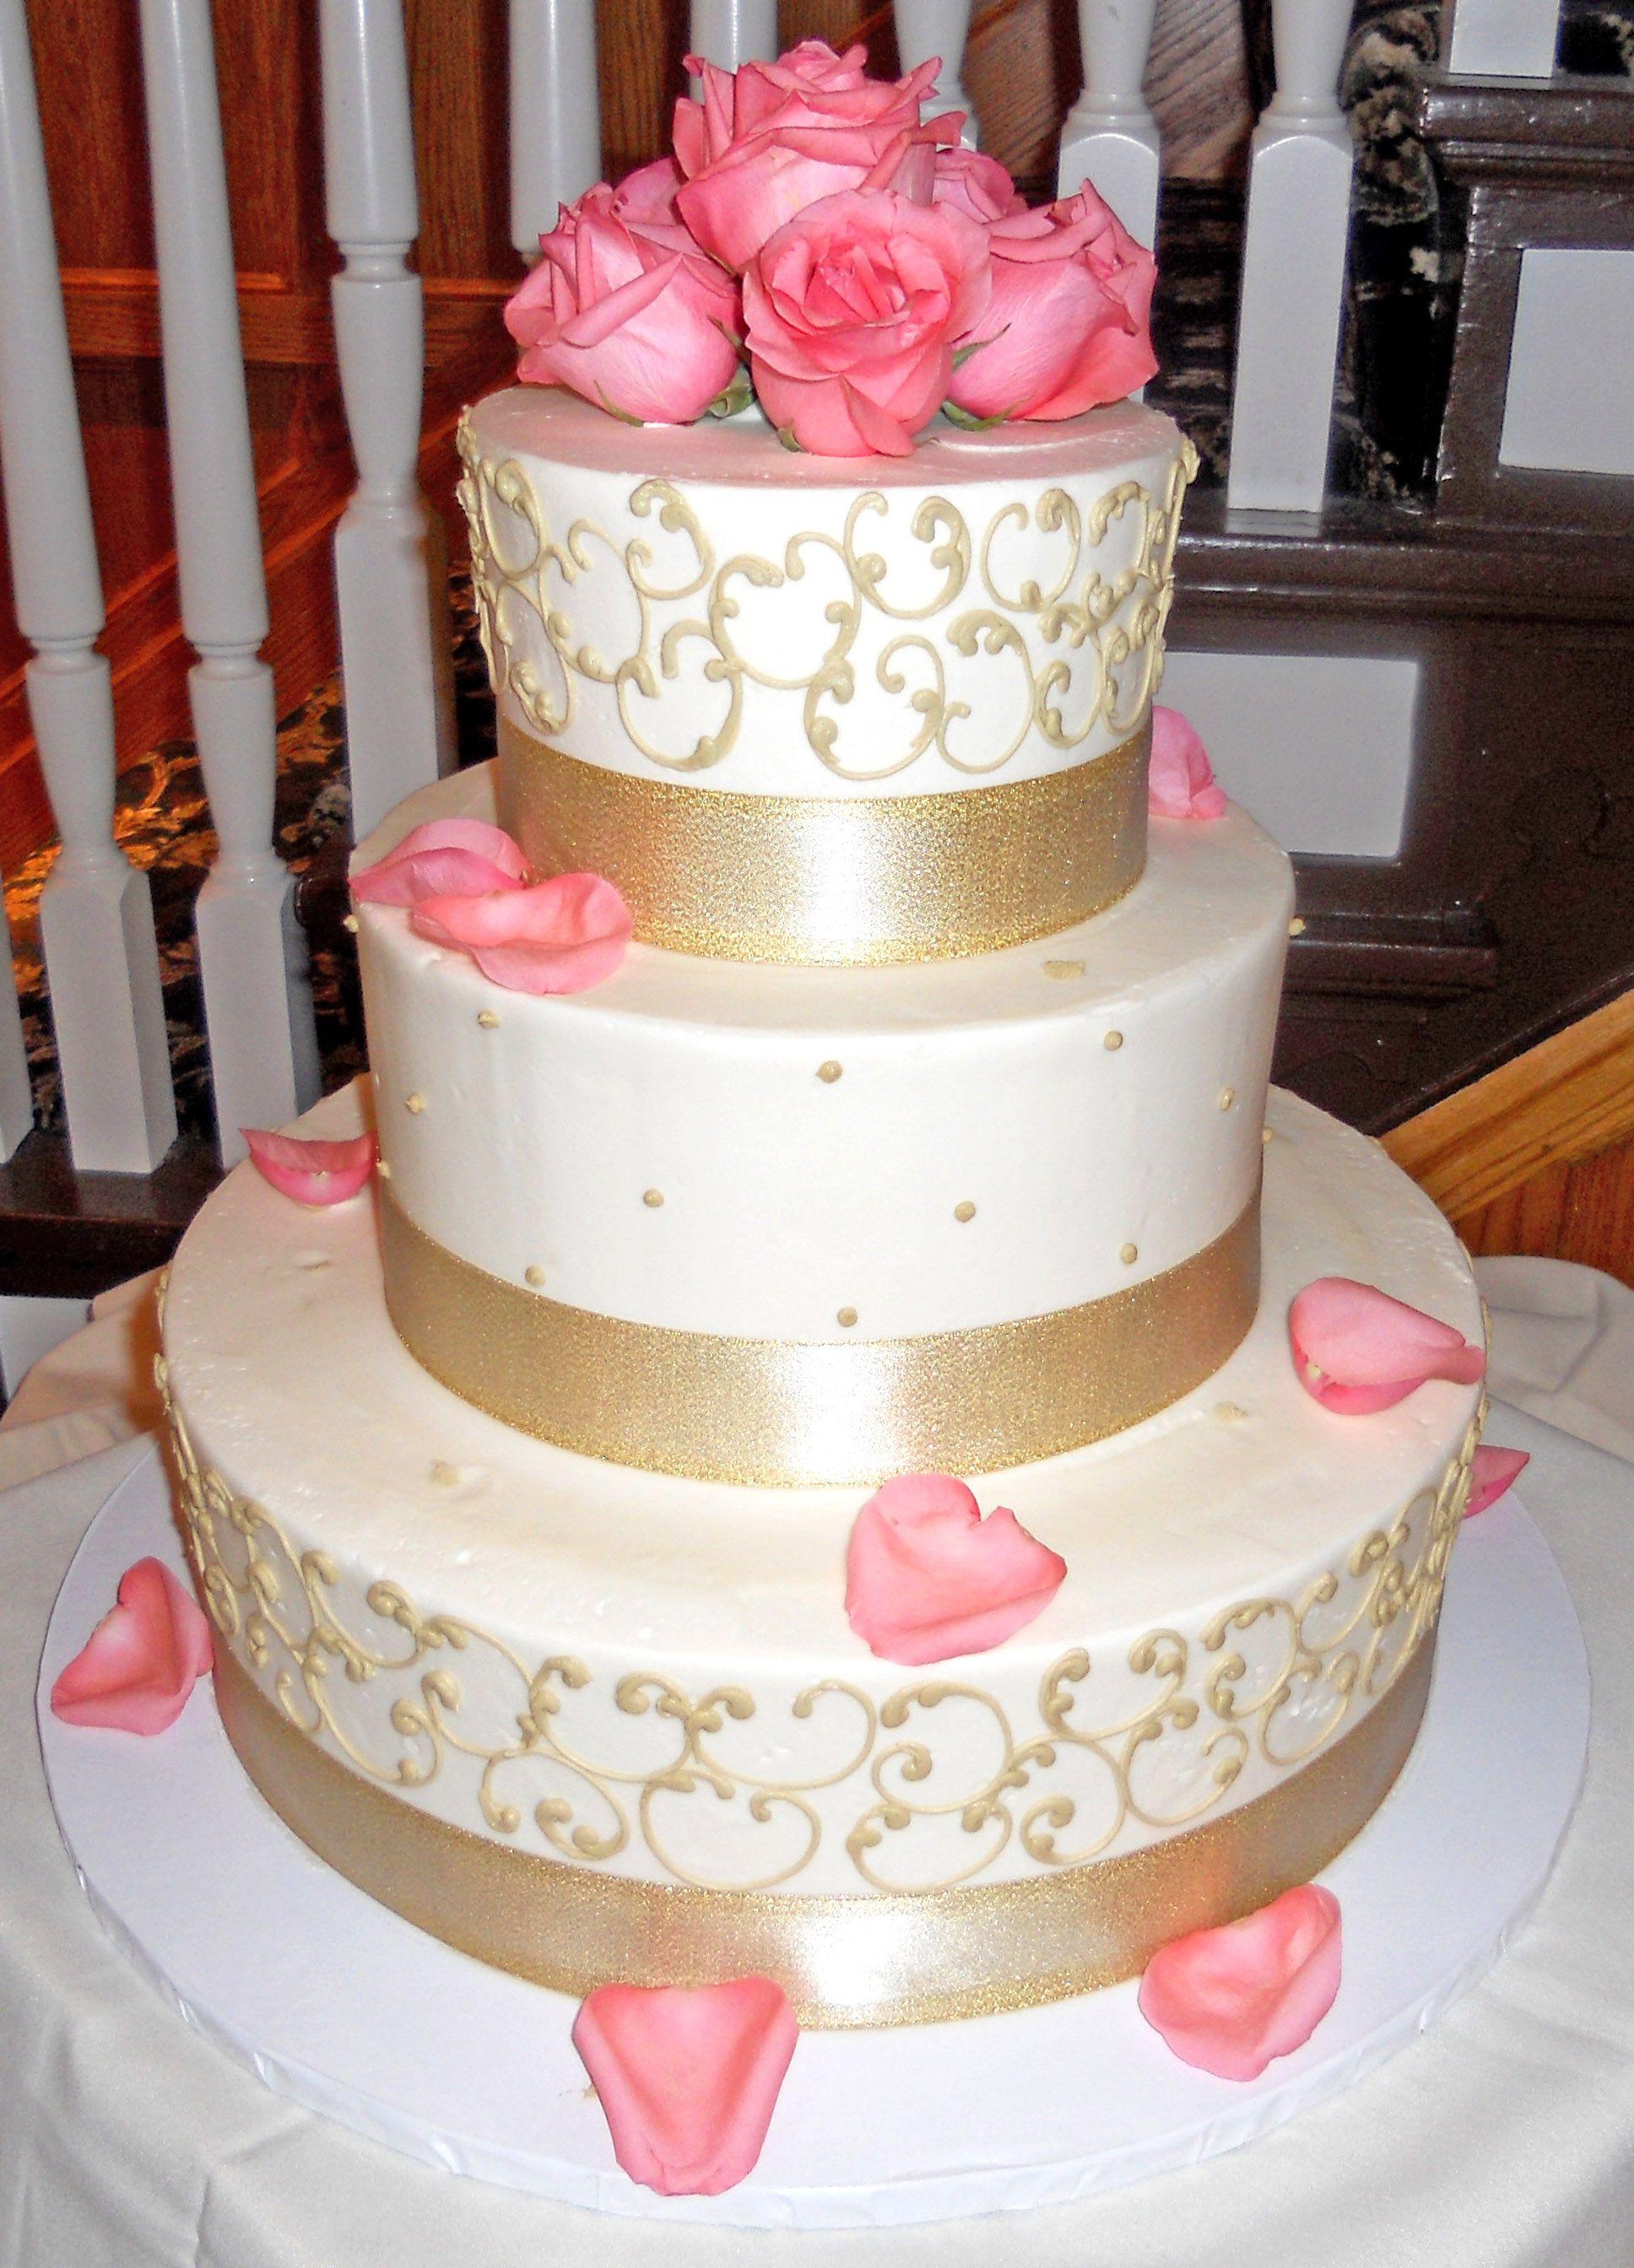 romantic wedding cakes usa - Jixy Wedding | Wedding | Pinterest